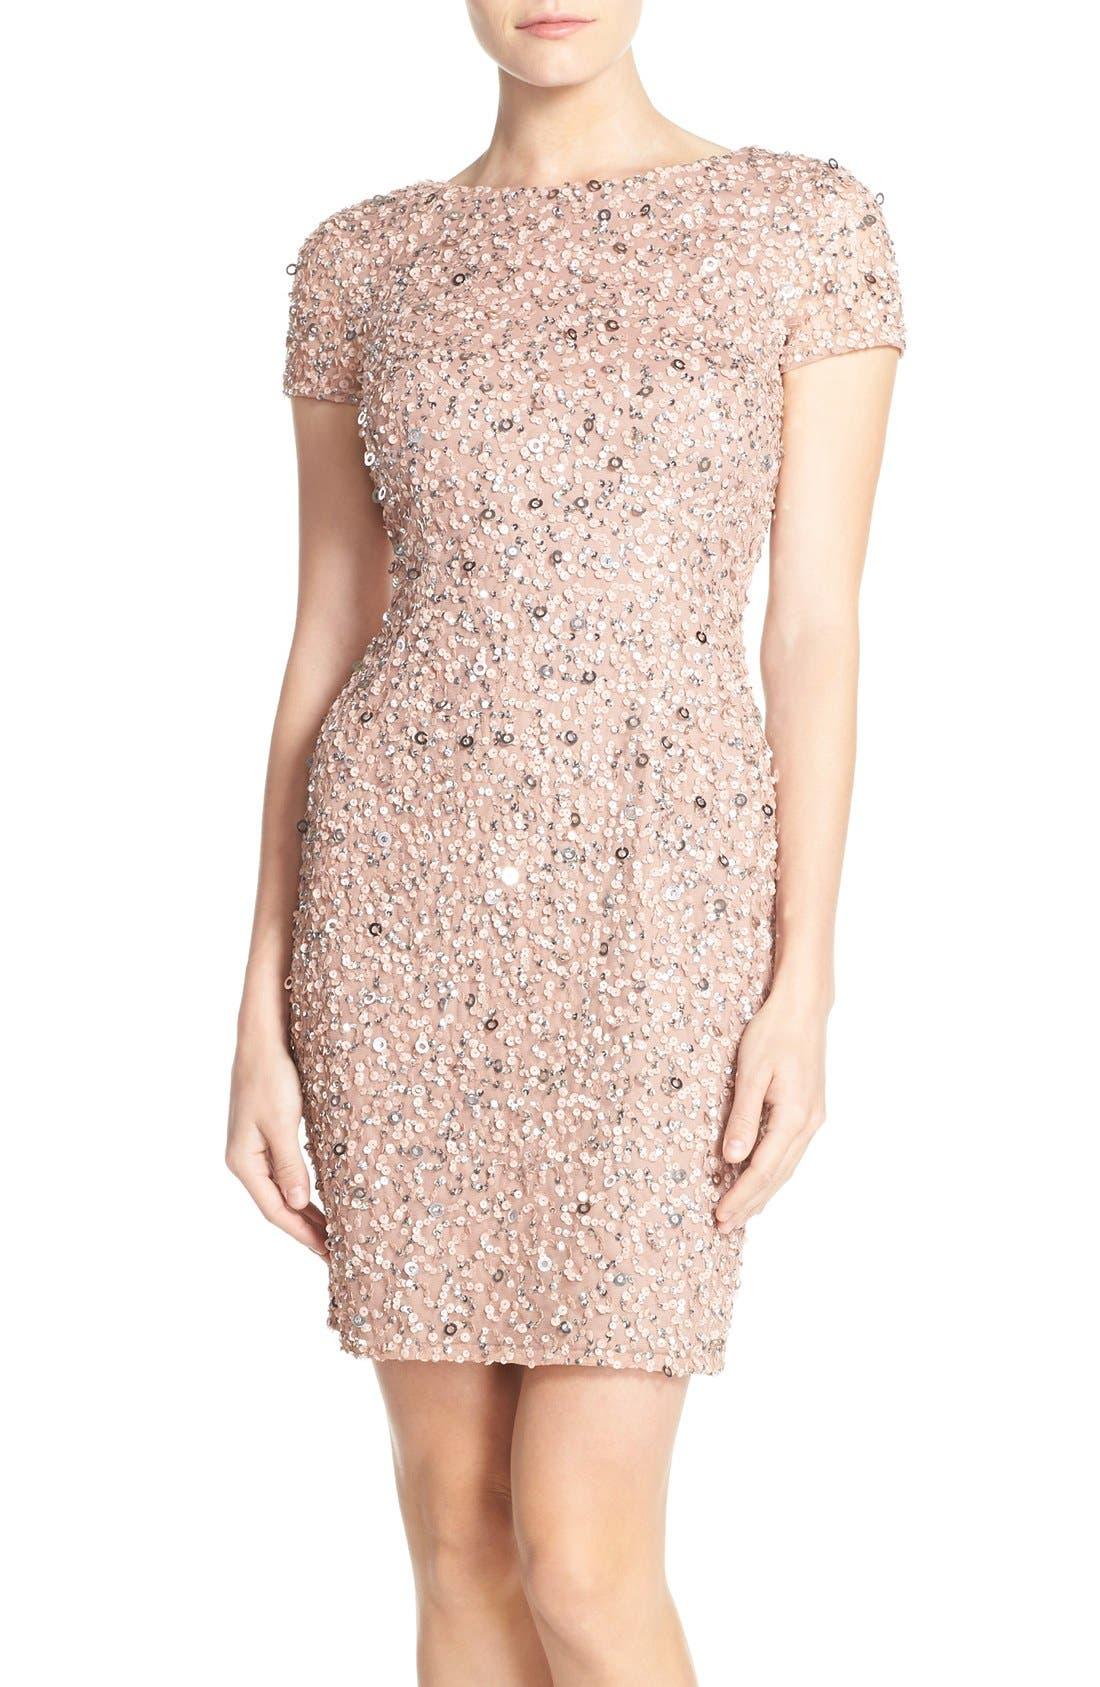 Alternate Image 1 Selected - Adrianna Papell Sequin Mesh Sheath Dress (Regular & Petite)